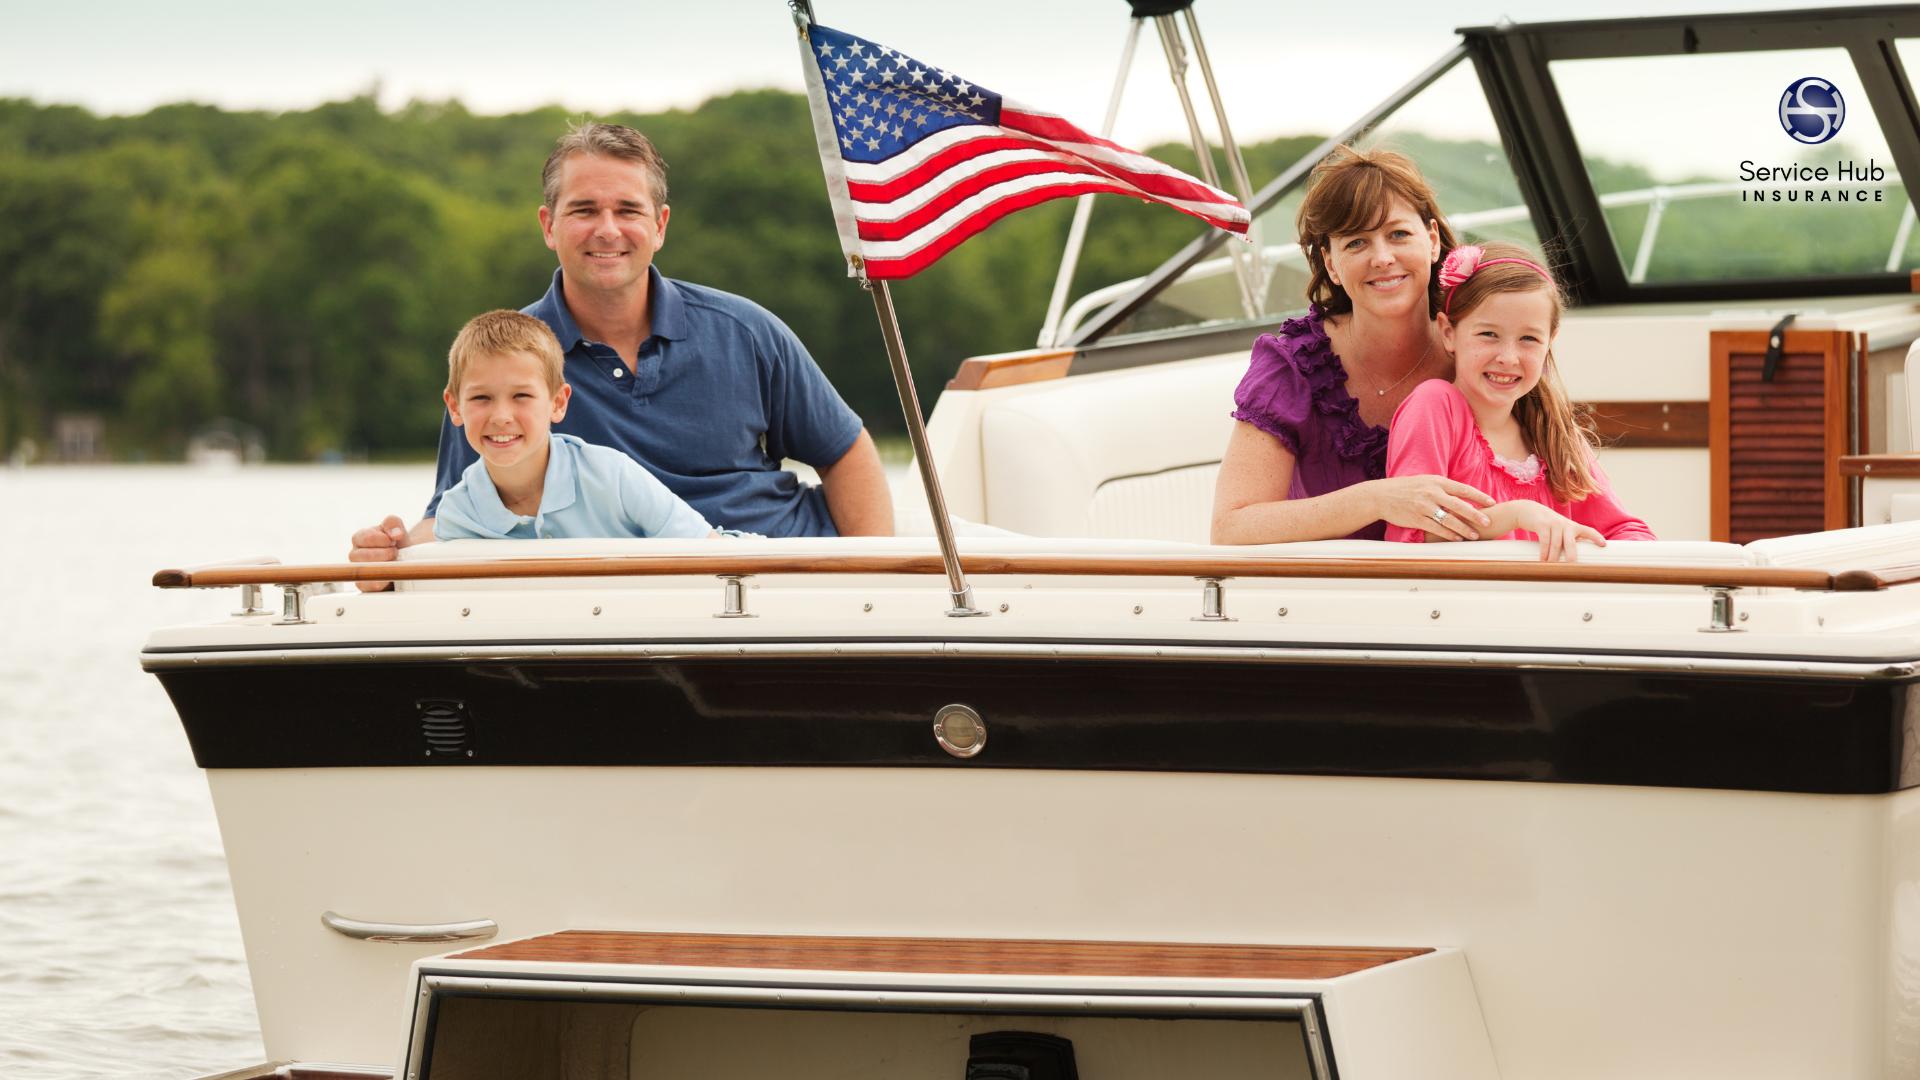 Boat Insurance - Service Hub Insurance -